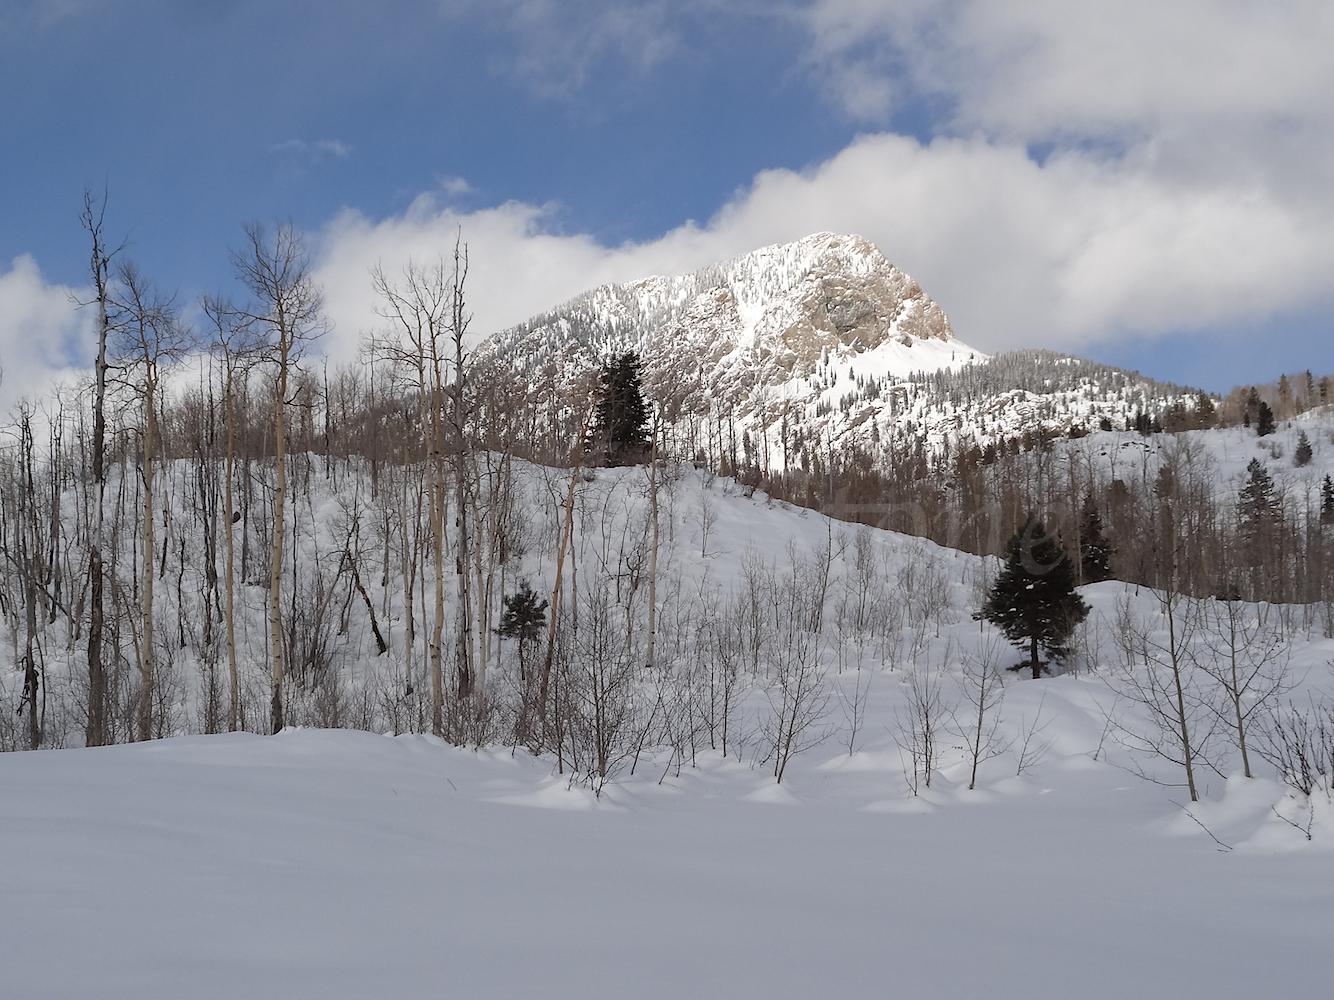 Lime Creek Road Snowshoe, Image #5311